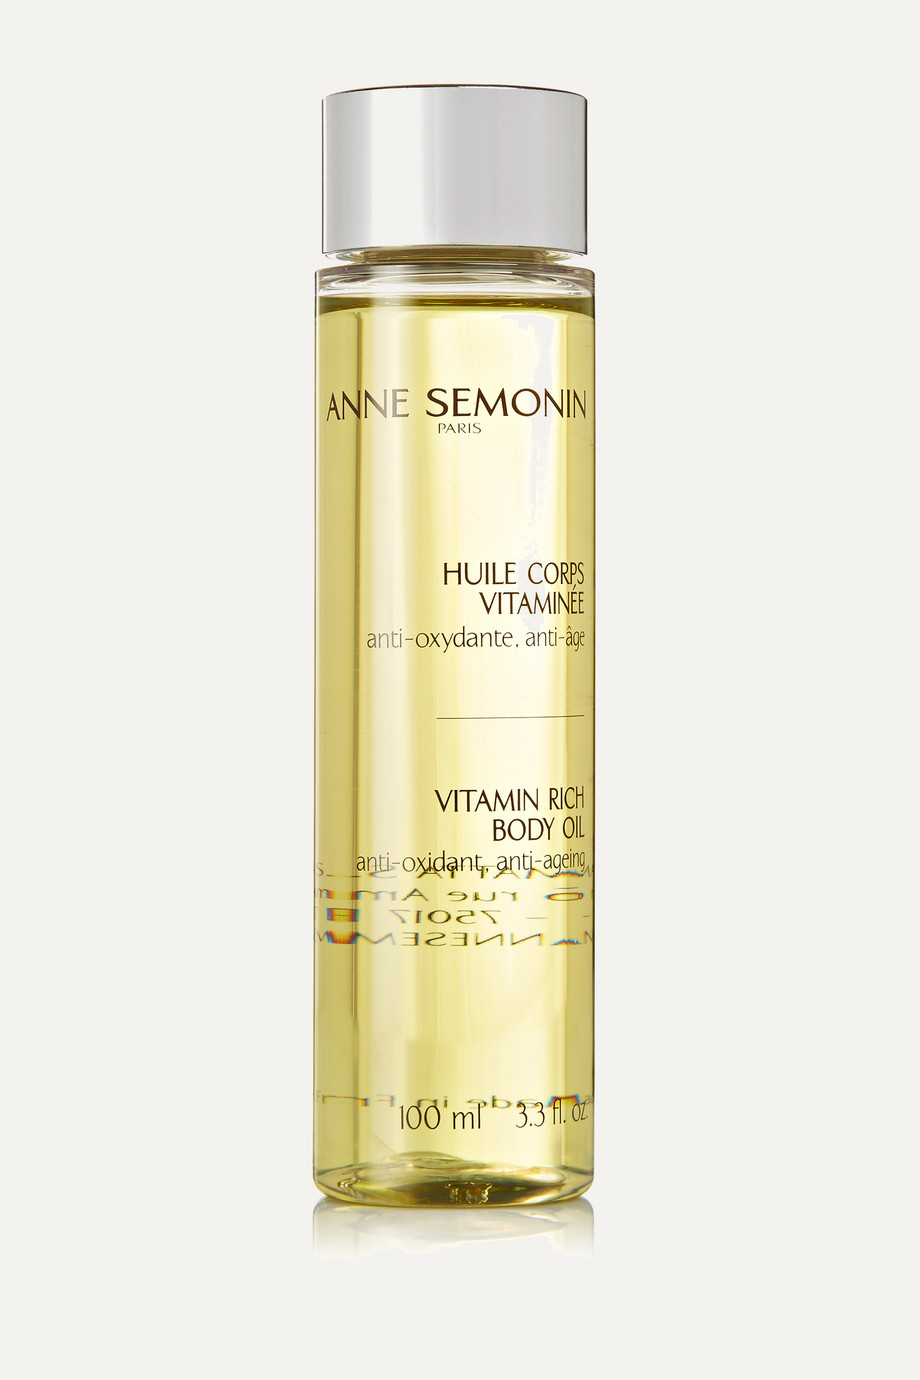 Anne Semonin Vitamin Rich Body Oil, 100ml